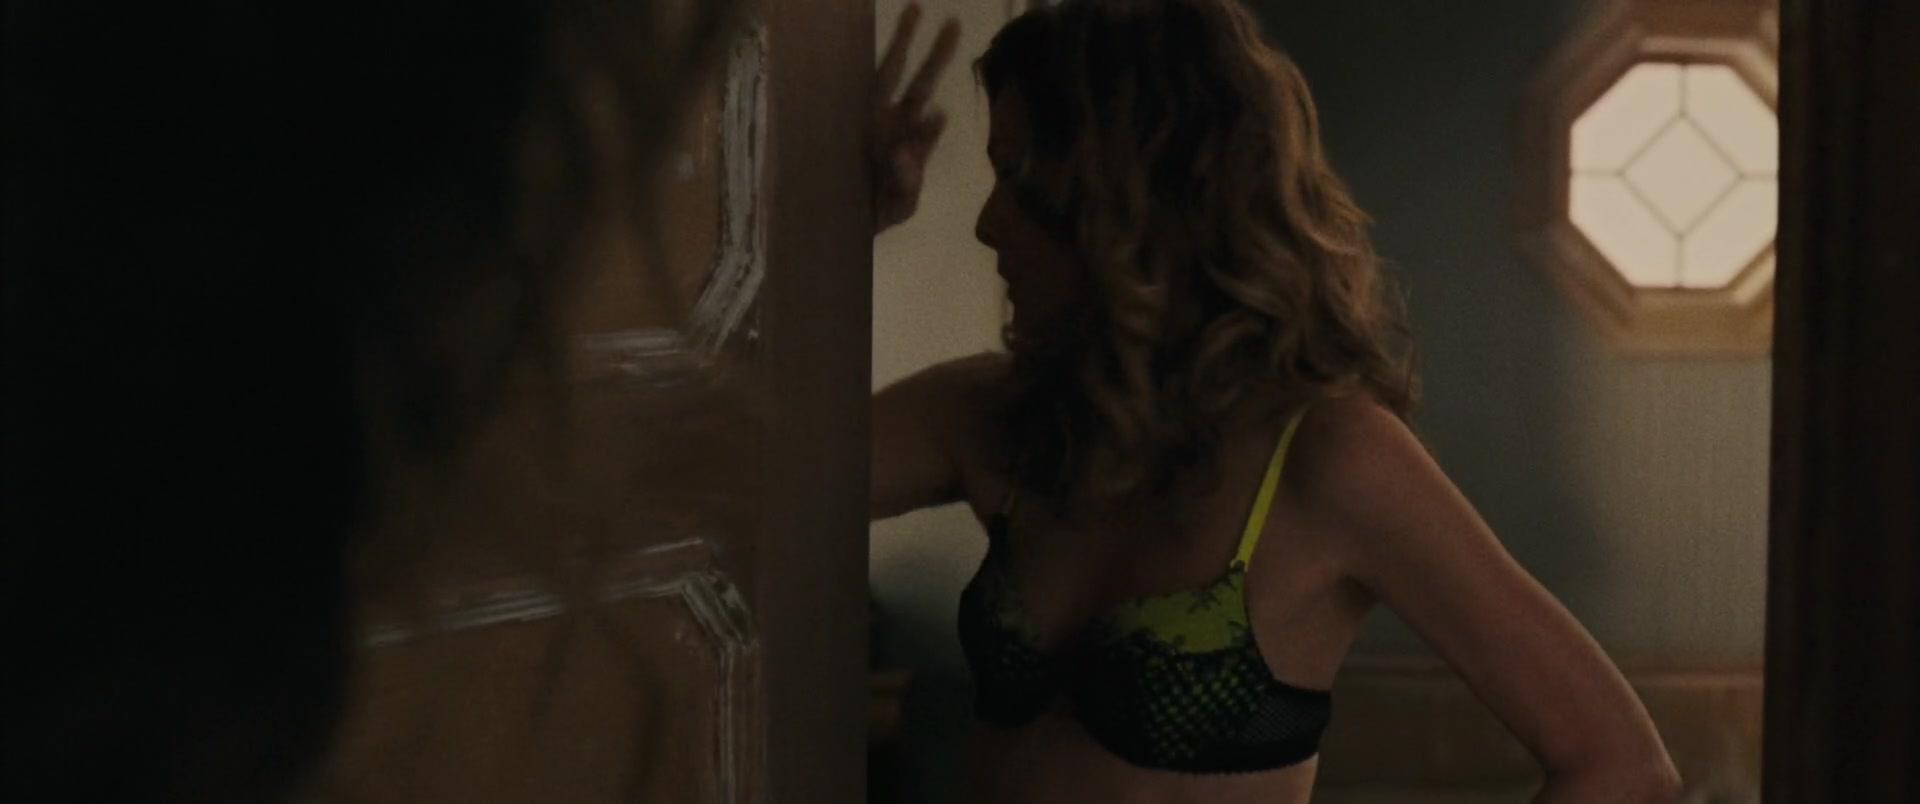 Jennifer-Lawrence-Michelle-Pfeiffer-Mother-20-thefappeningblog.com_.jpg